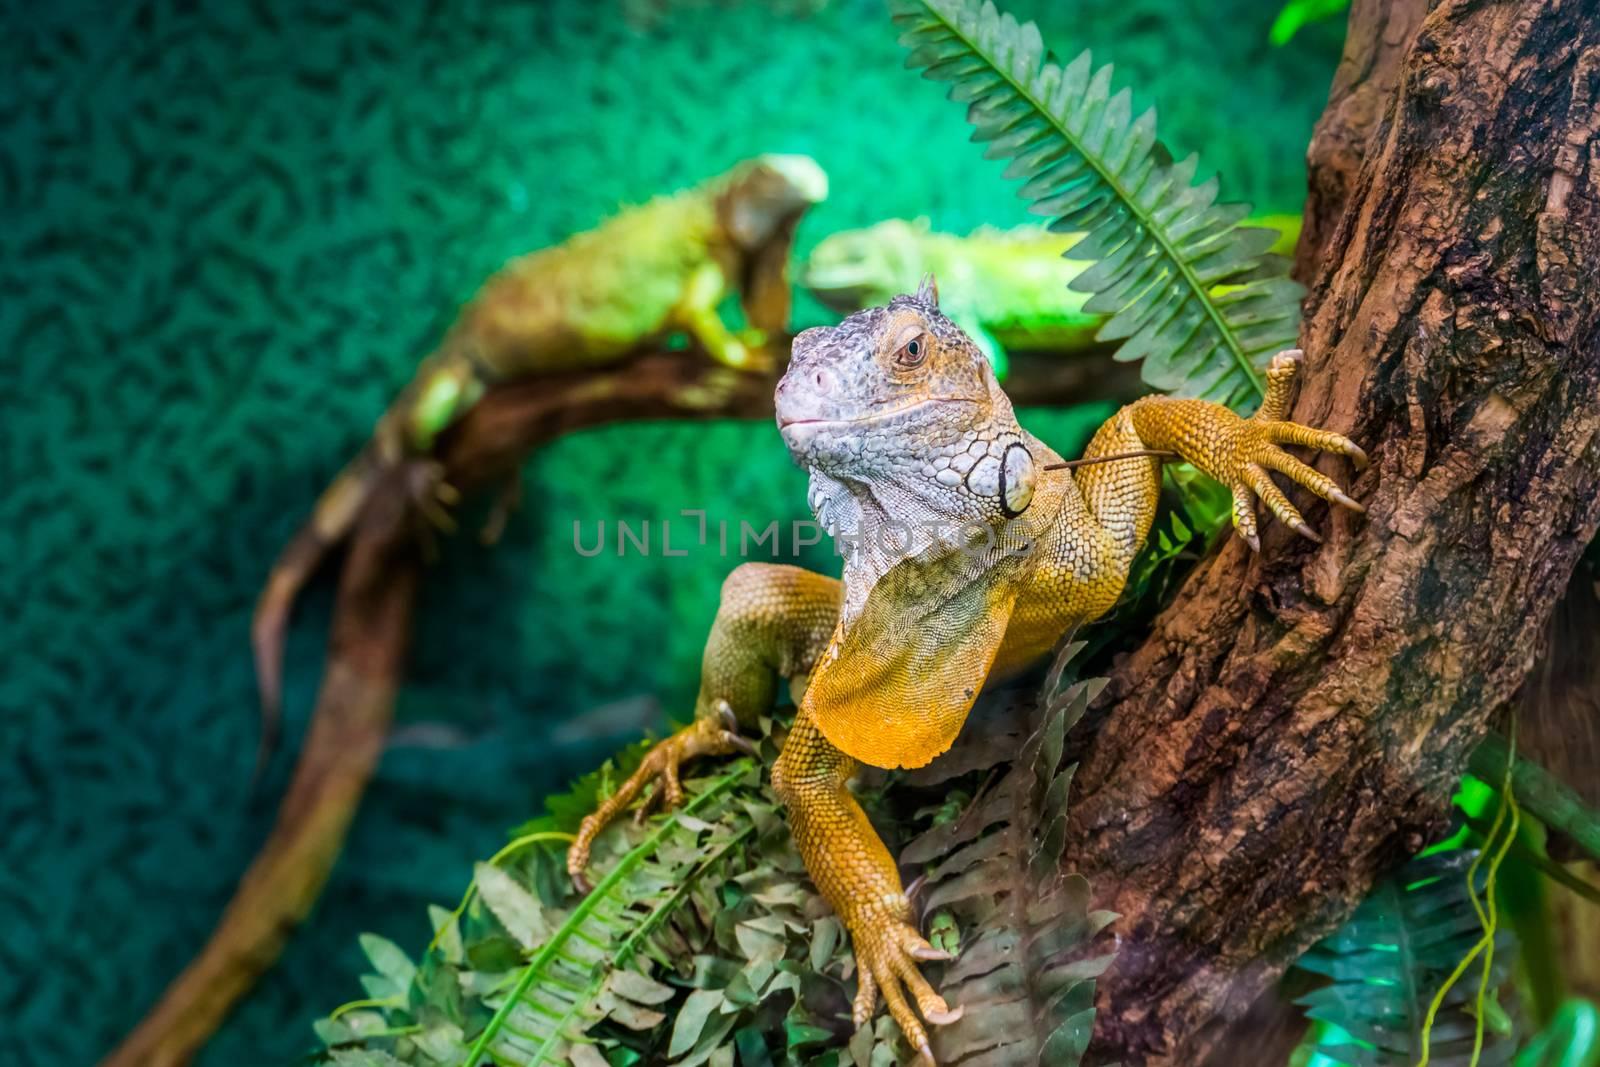 beautiful closeup portrait of a american green iguana in a tree, tropical lizard specie from America, popular exotic pets